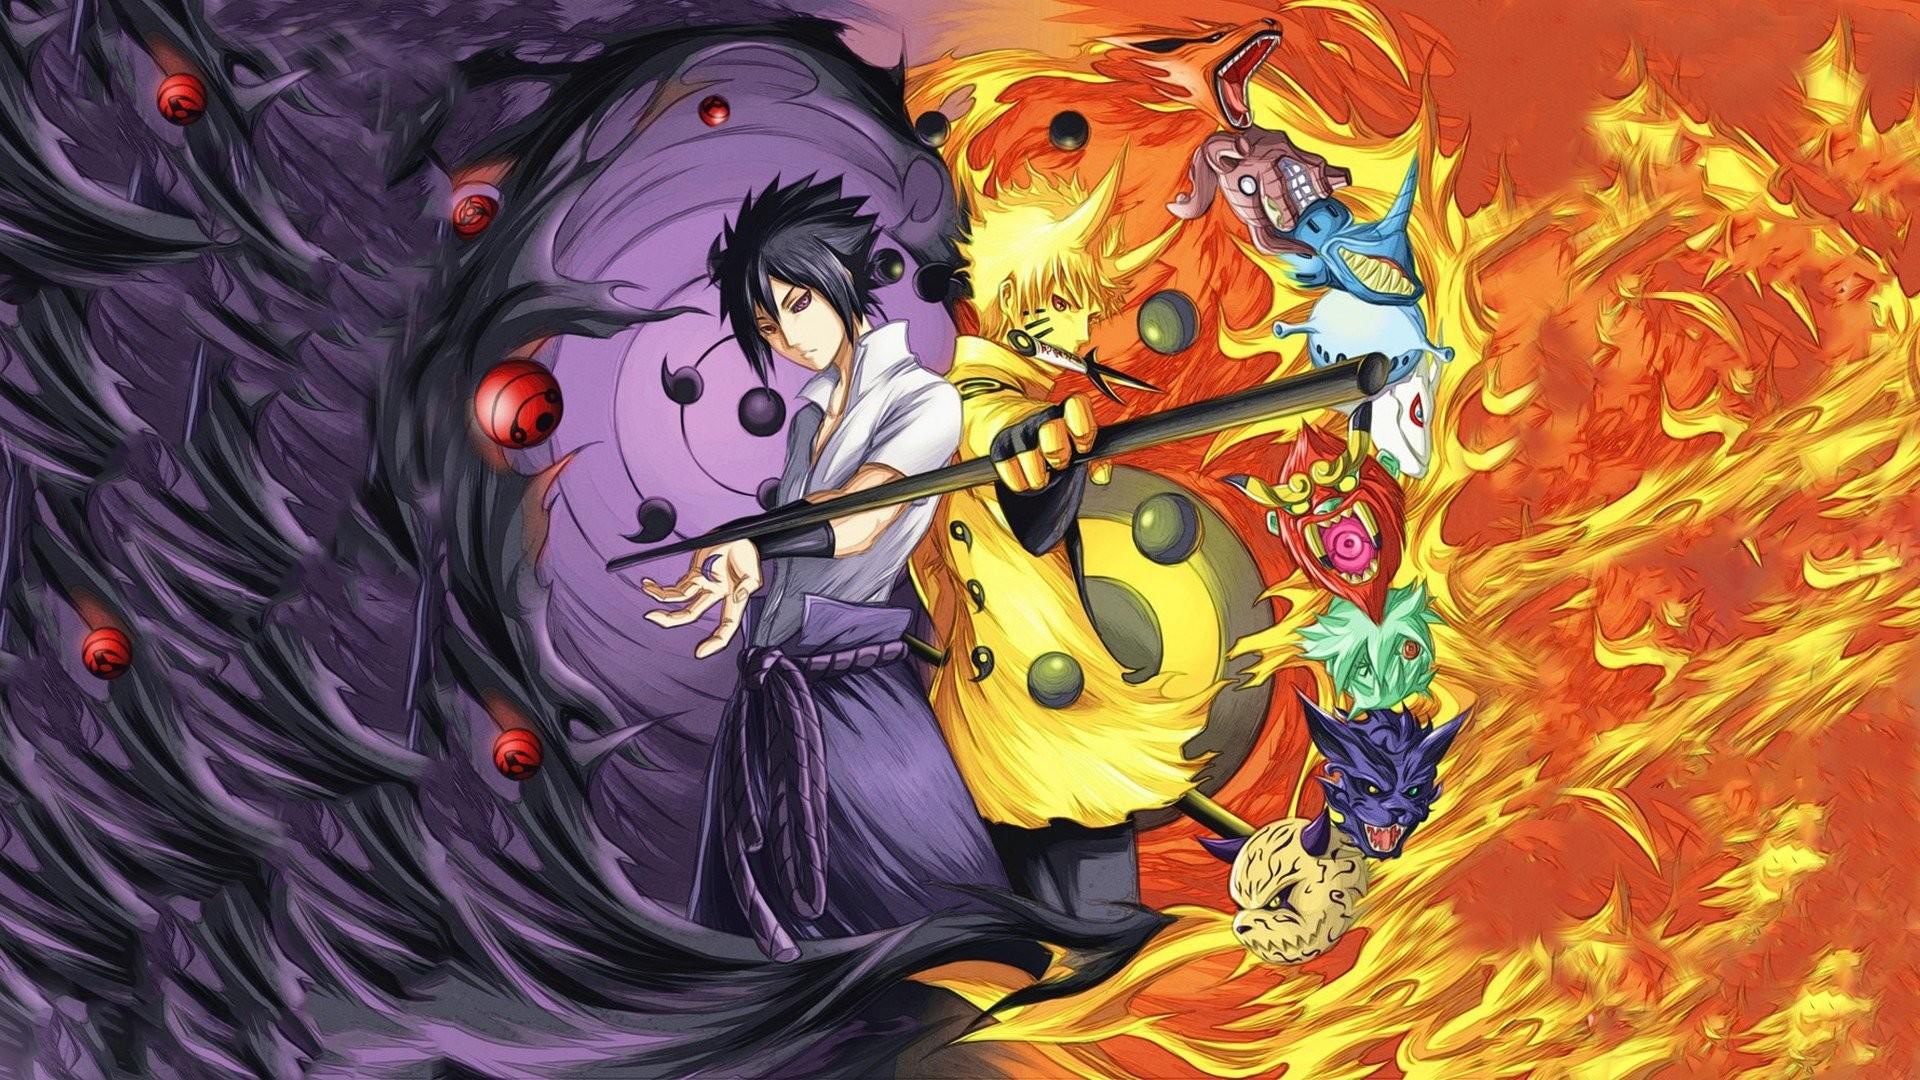 1920x1080 Naruto wallpaper - Anime wallpapers - #13704